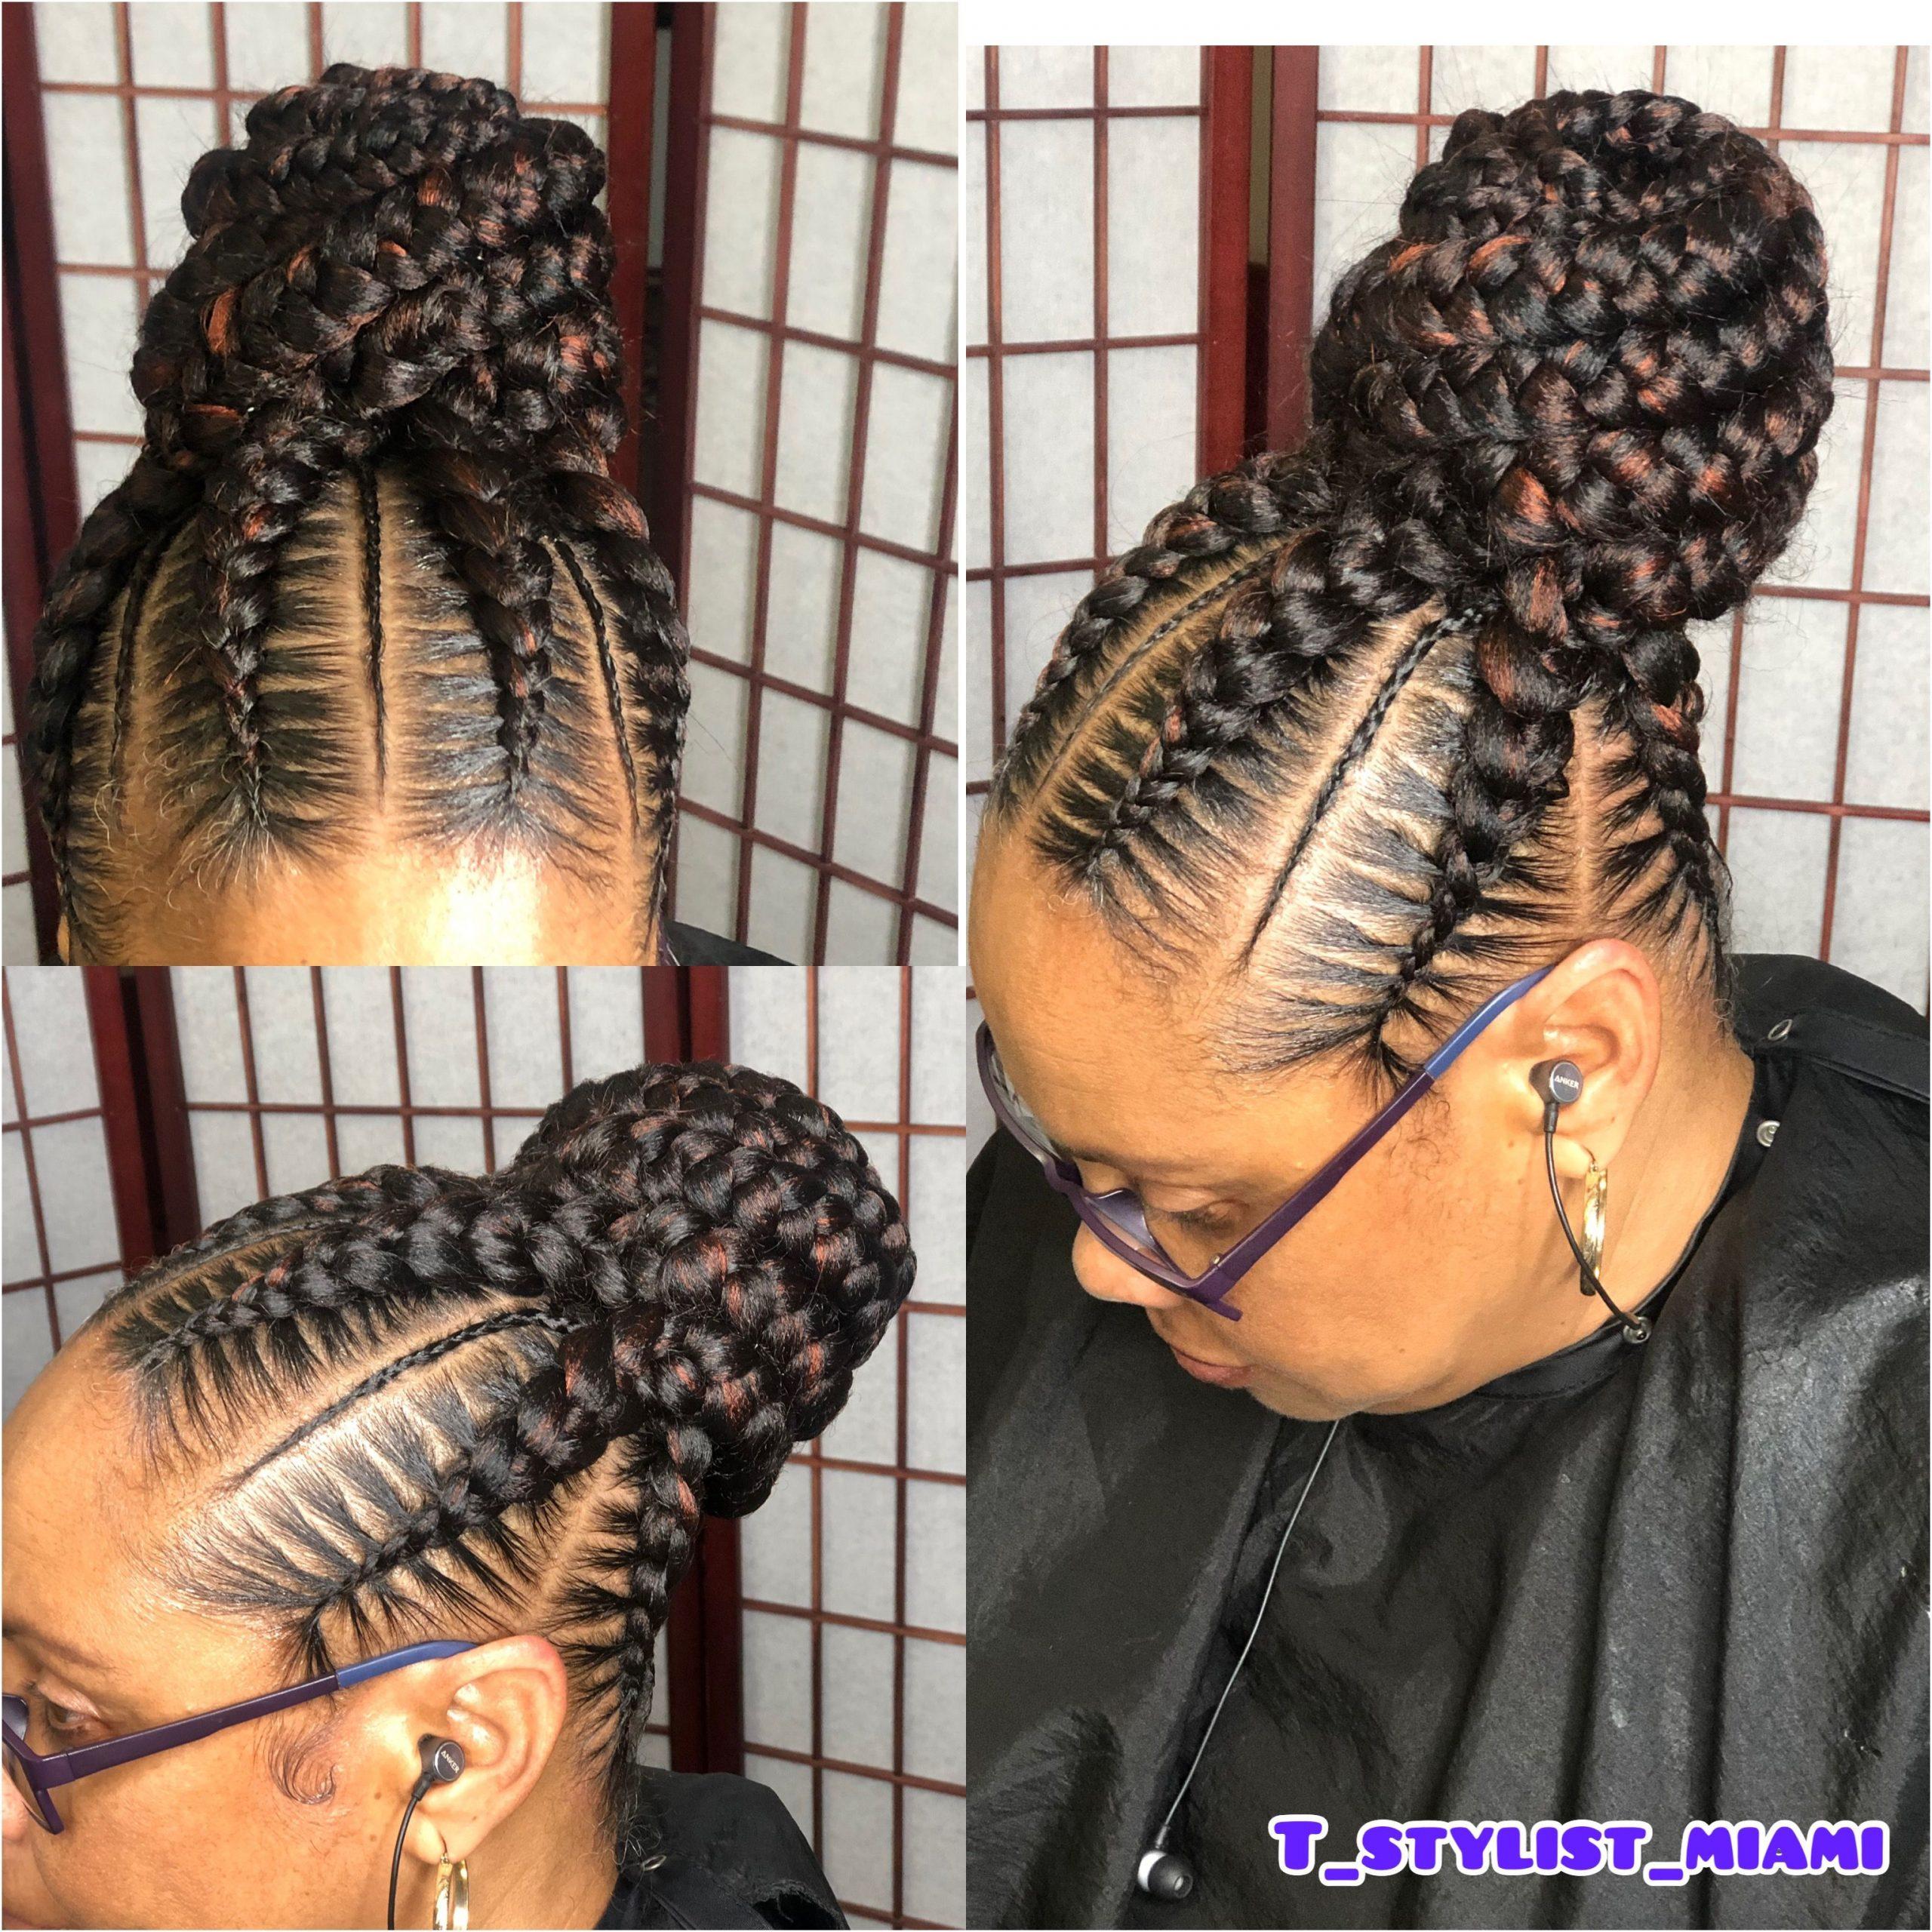 Hair Braid Models Preferred by Brides This Year in Nigeria and Ghana Weddings